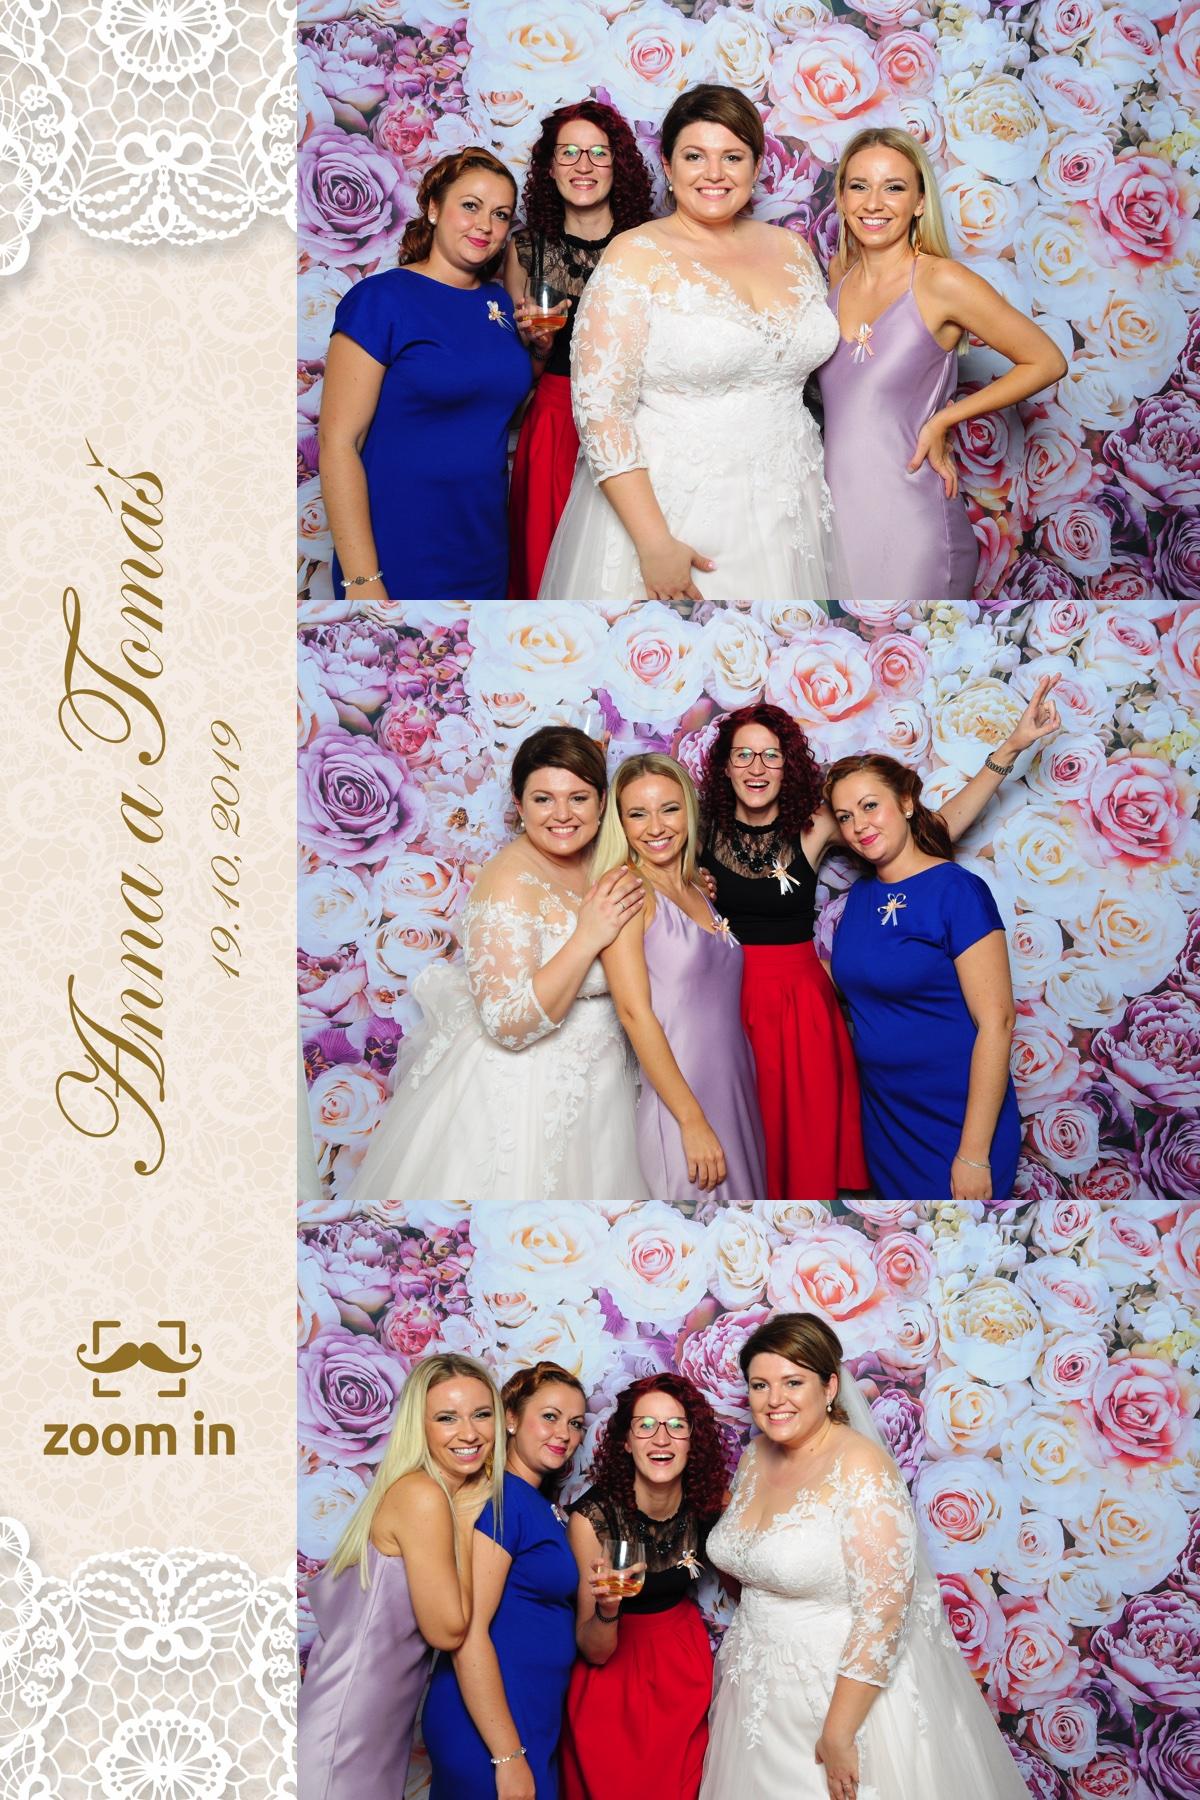 st petrus vini fotobudka svadba